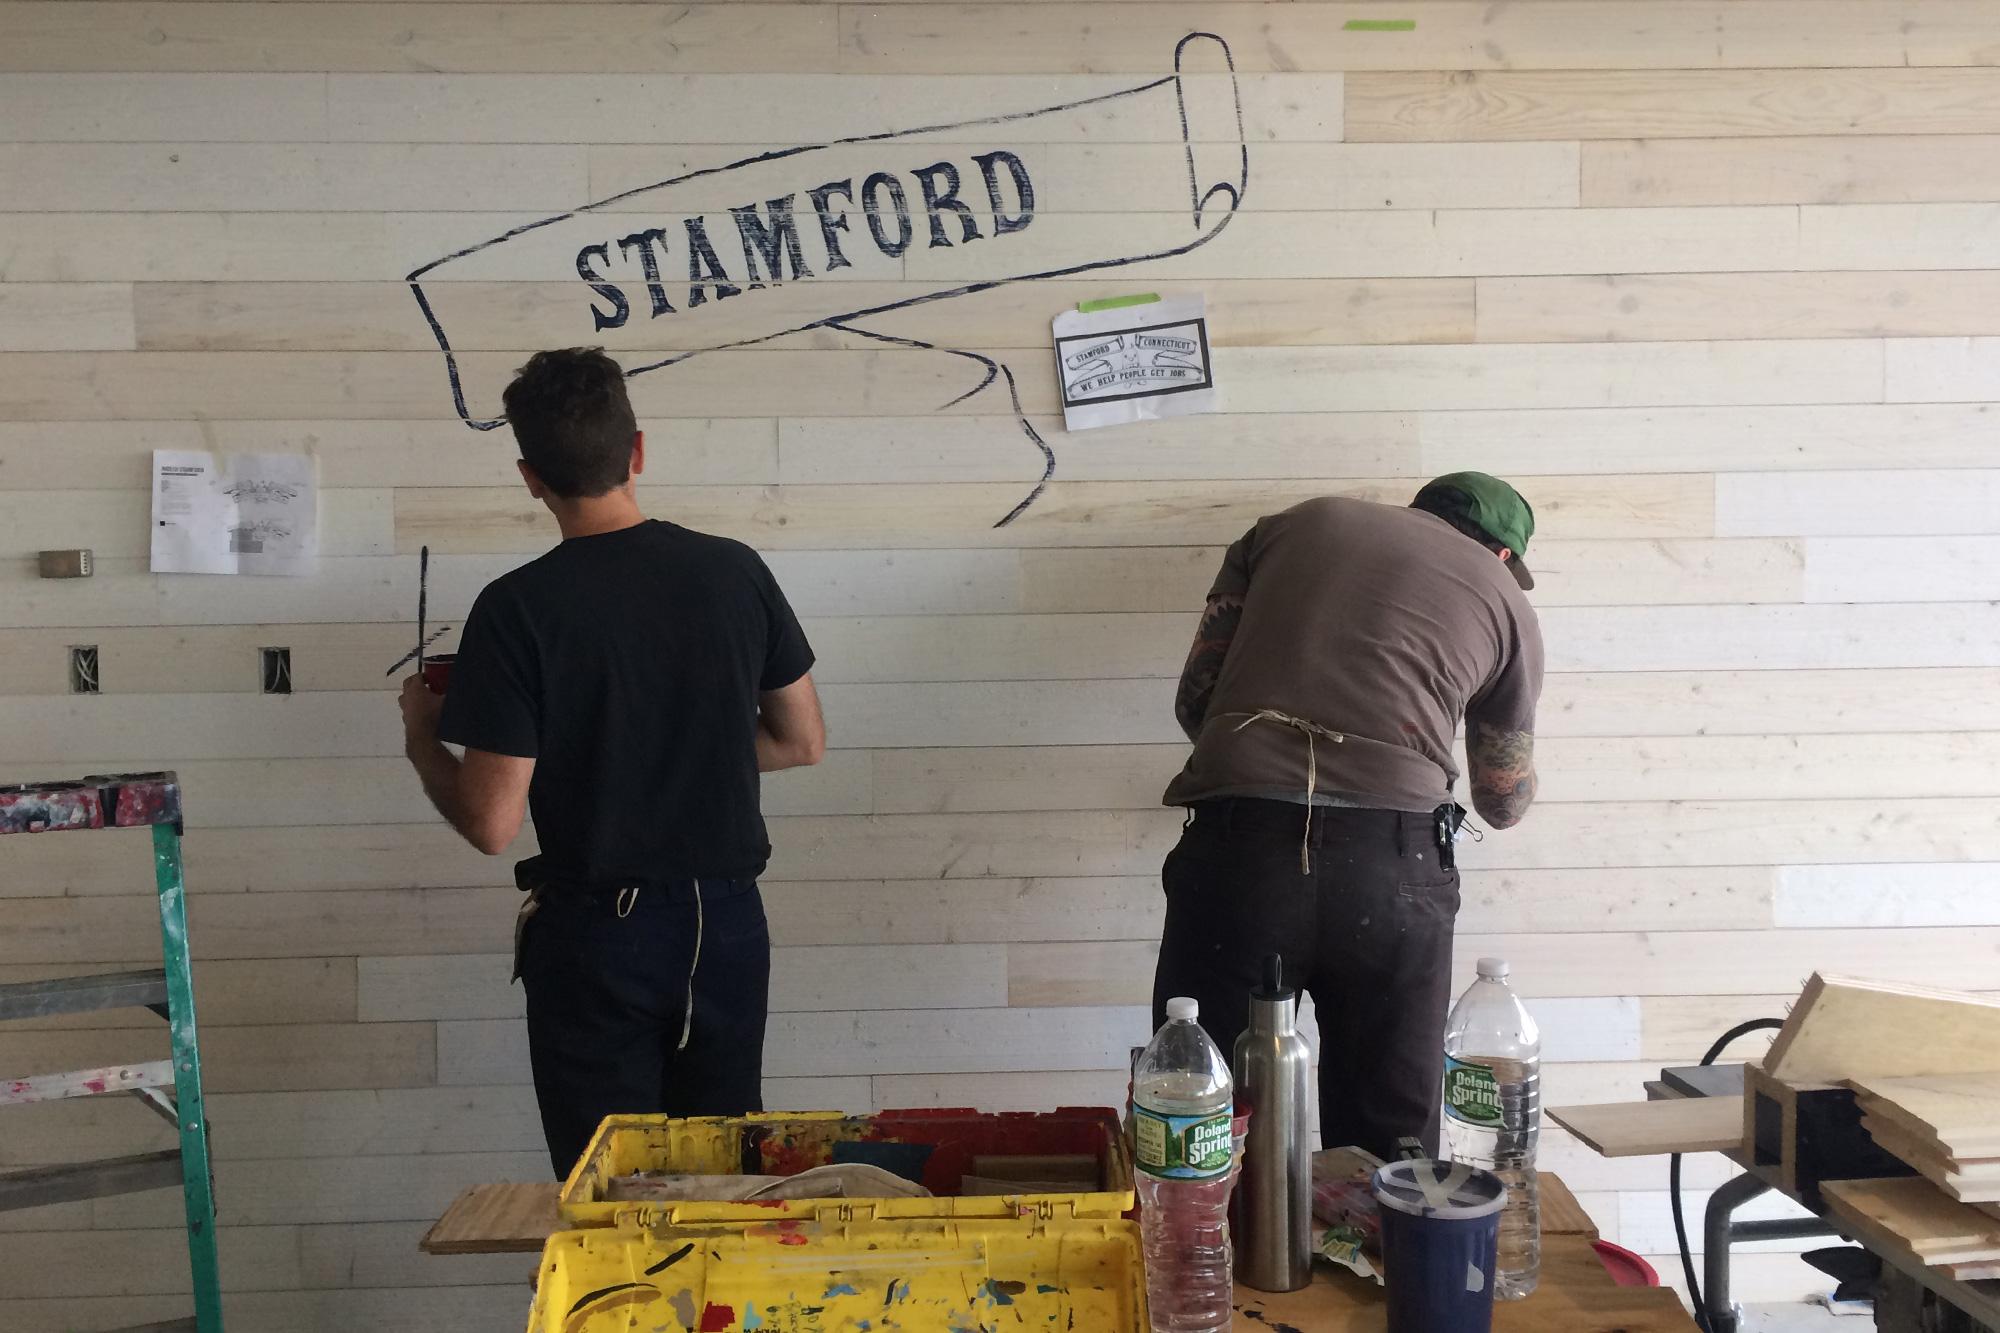 Indeed Stamford